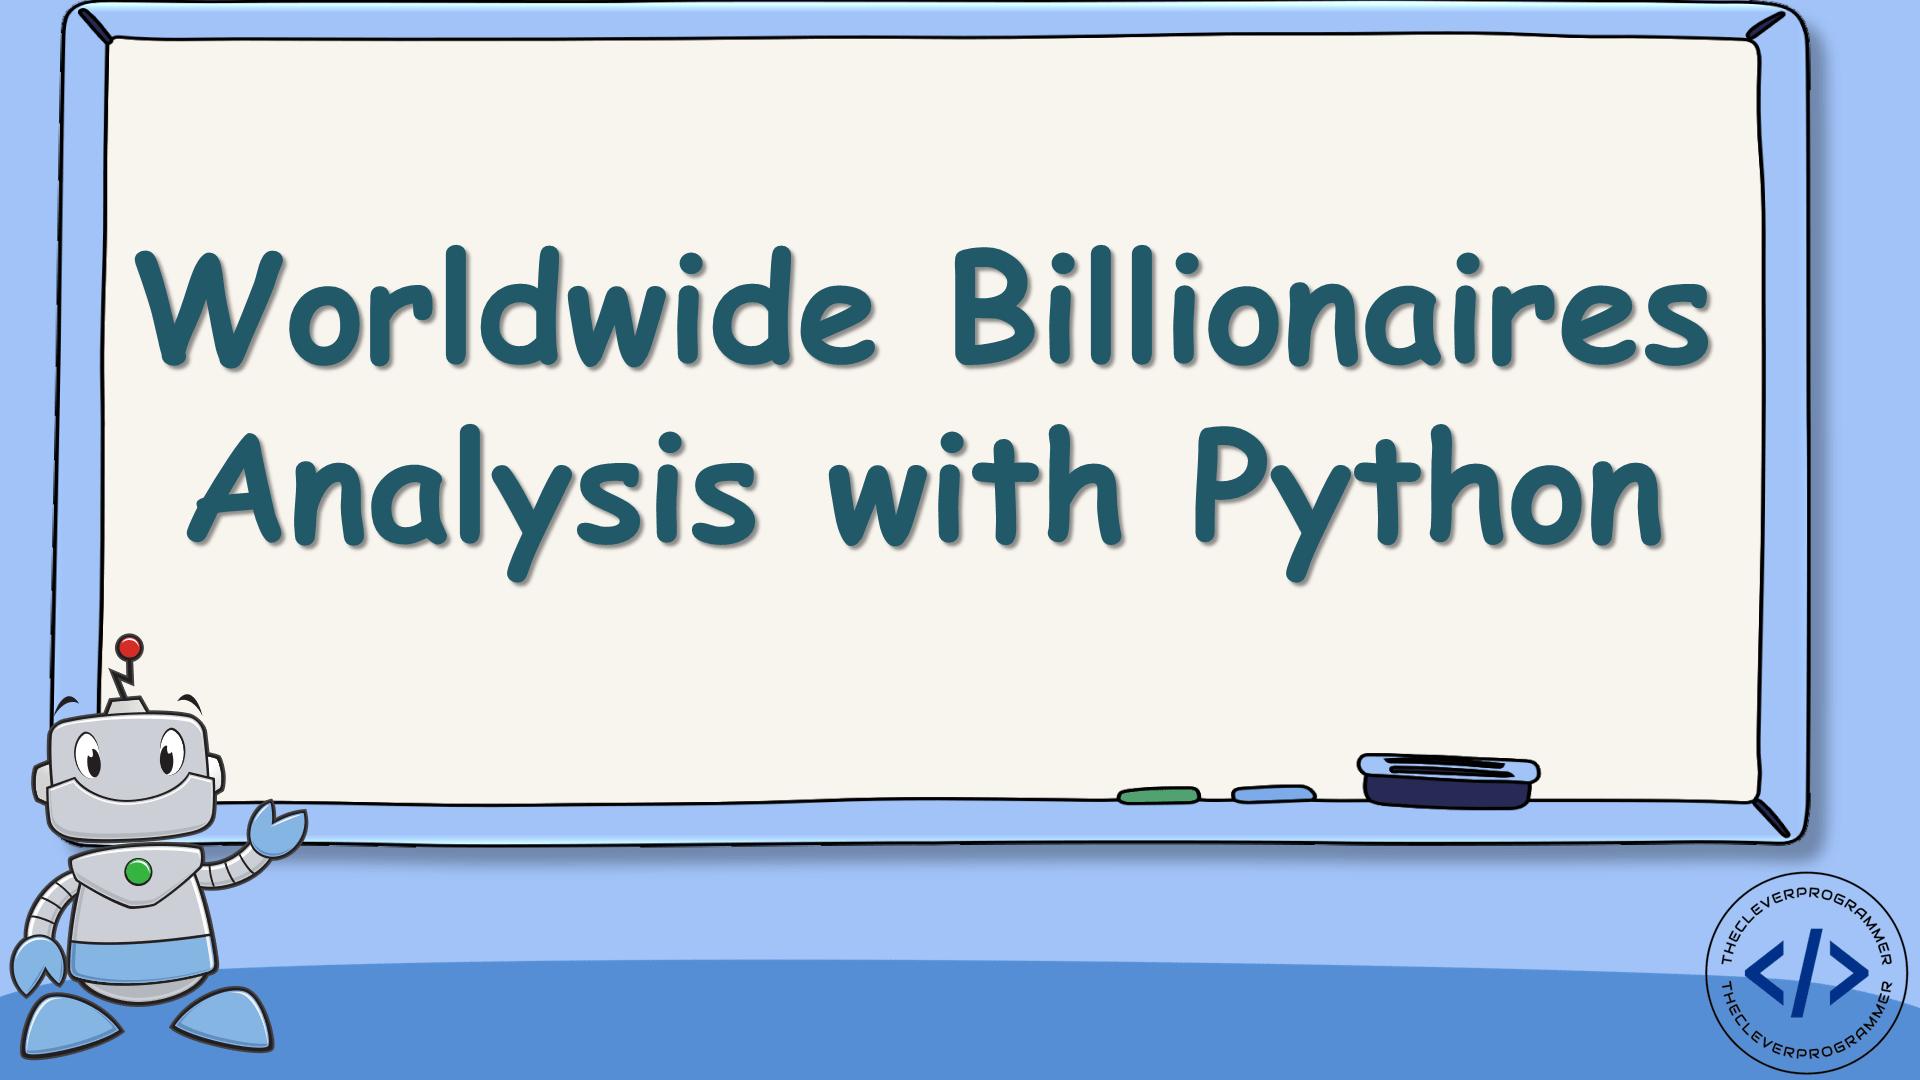 Billionaires Analysis with Python